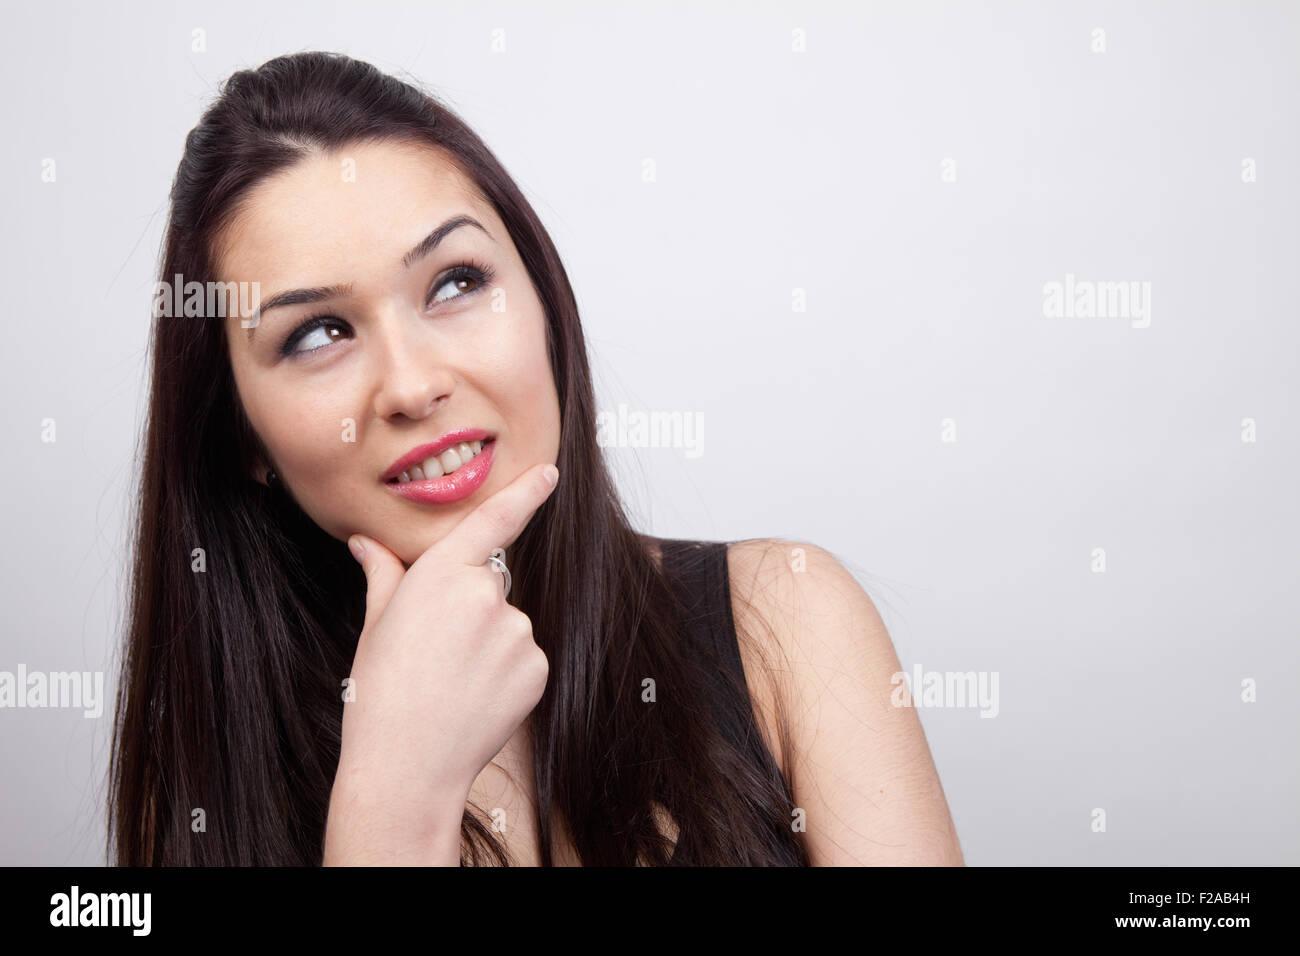 Creative pensive cute woman ayant une idée Photo Stock